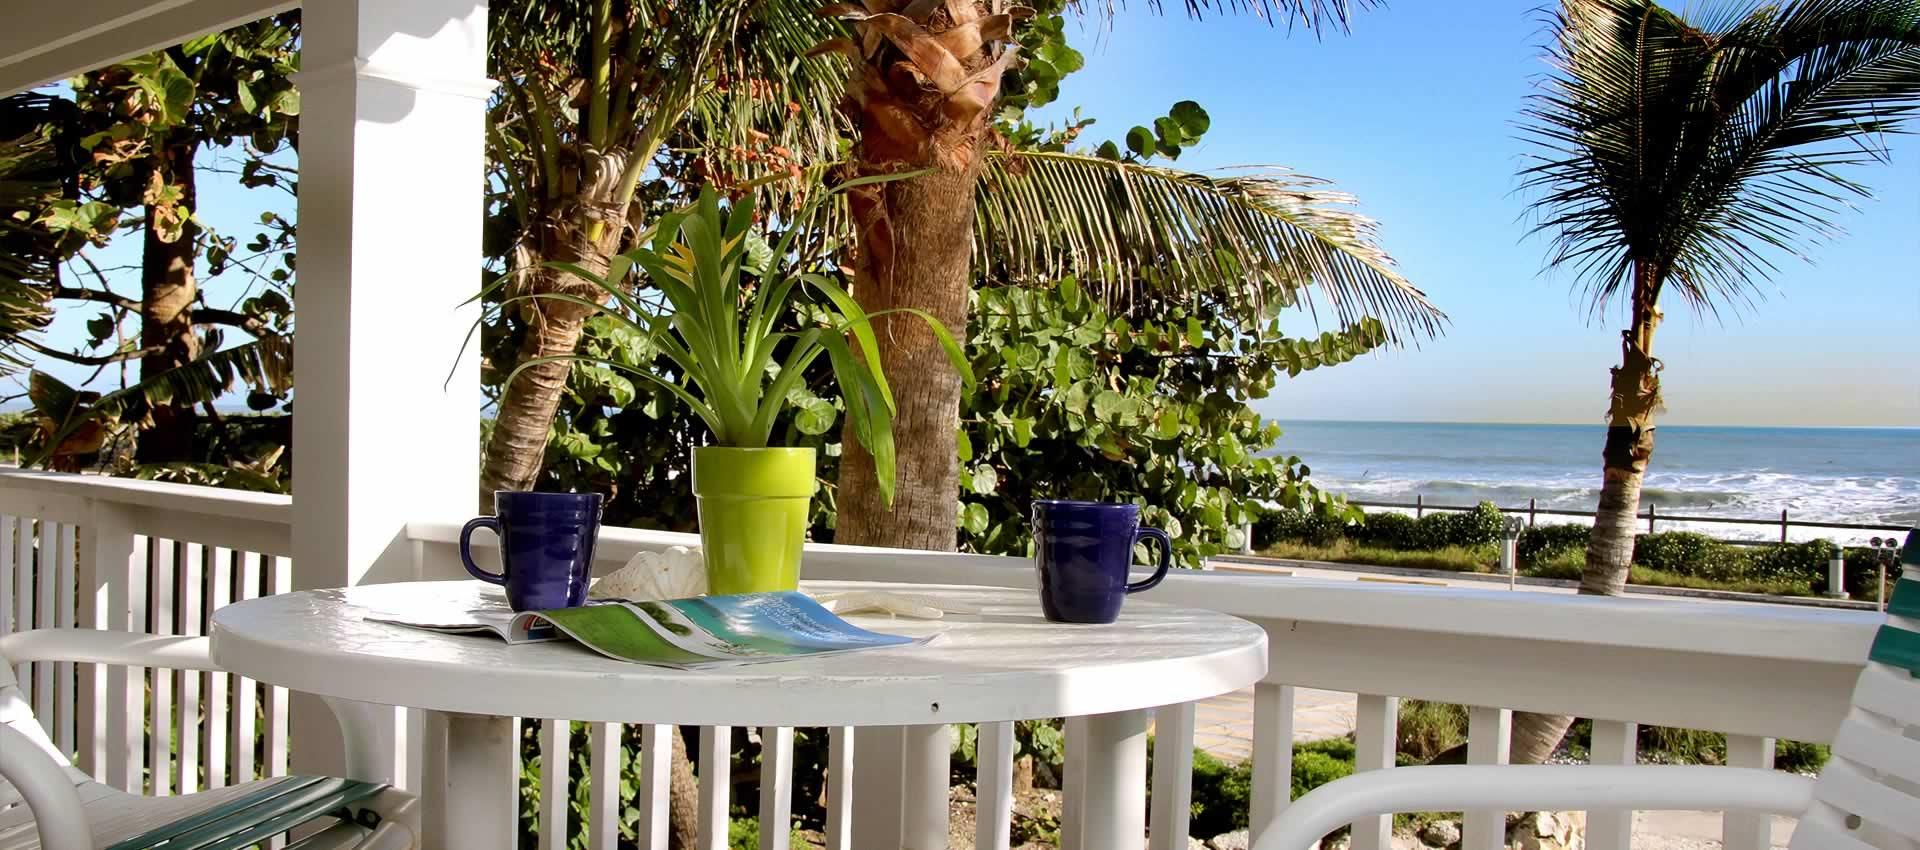 oceanfront-cottages-deck-view-2